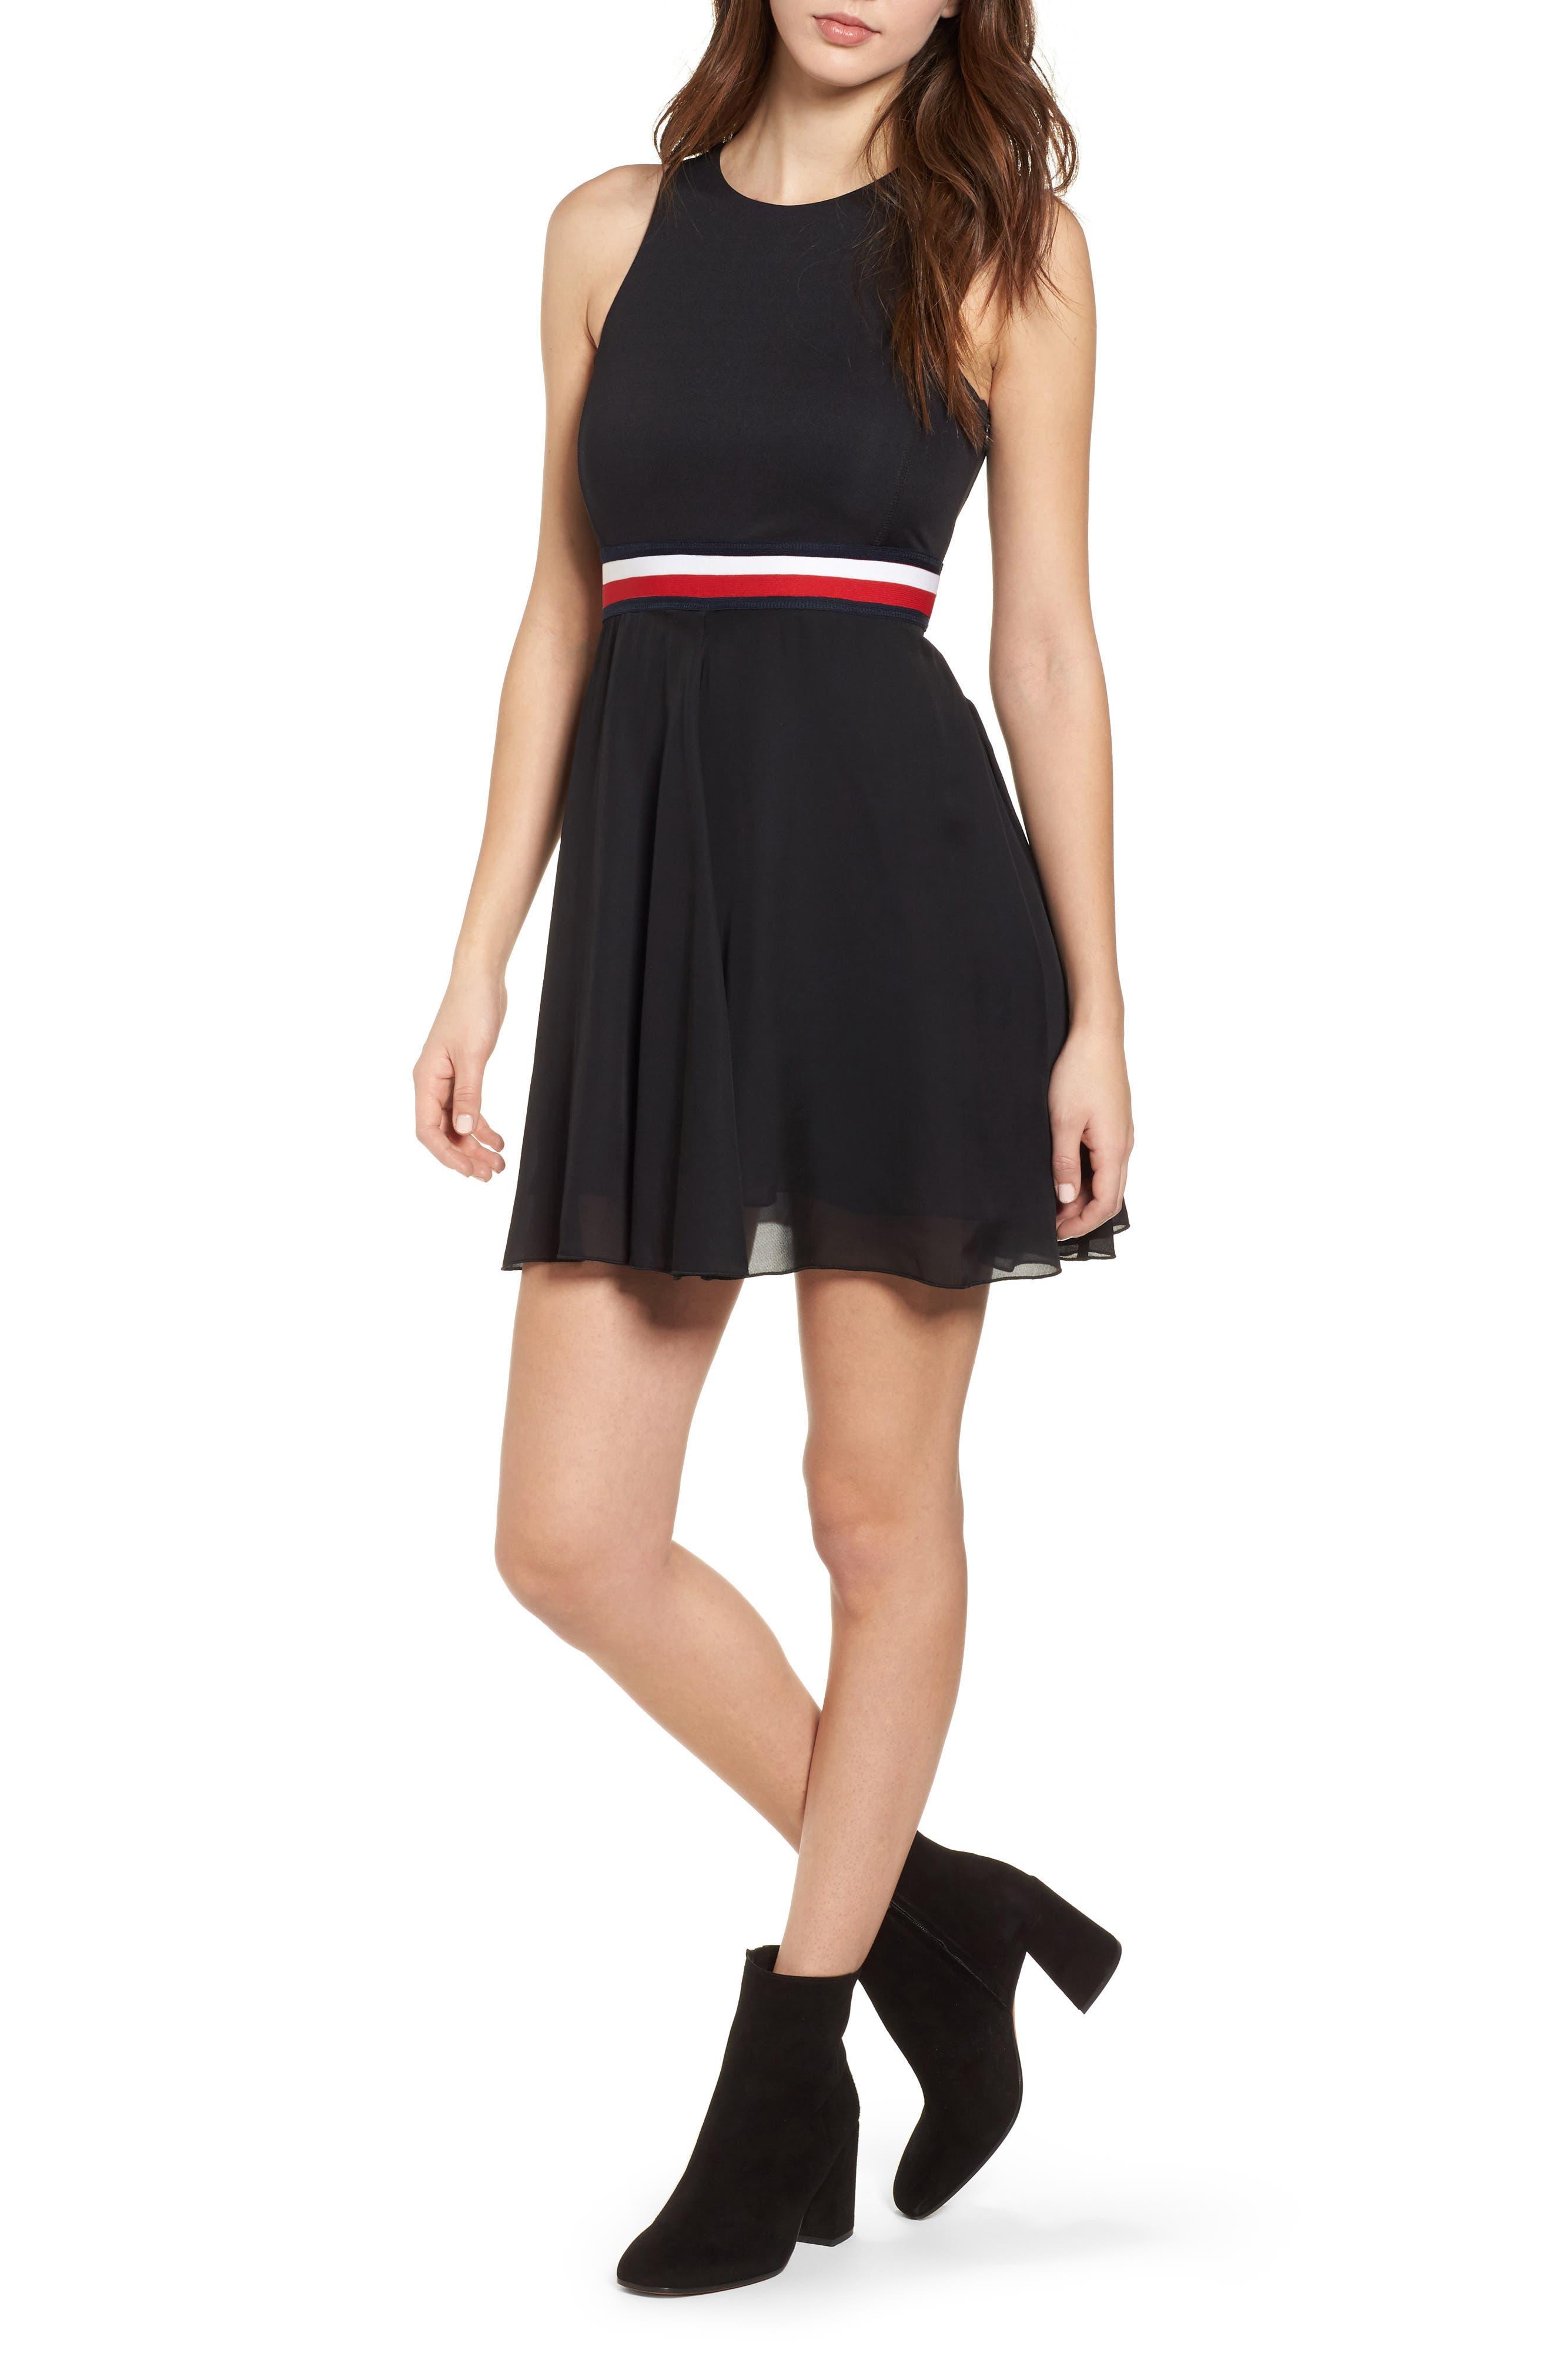 x Gigi Hadid Racerback Dress,                             Main thumbnail 1, color,                             001